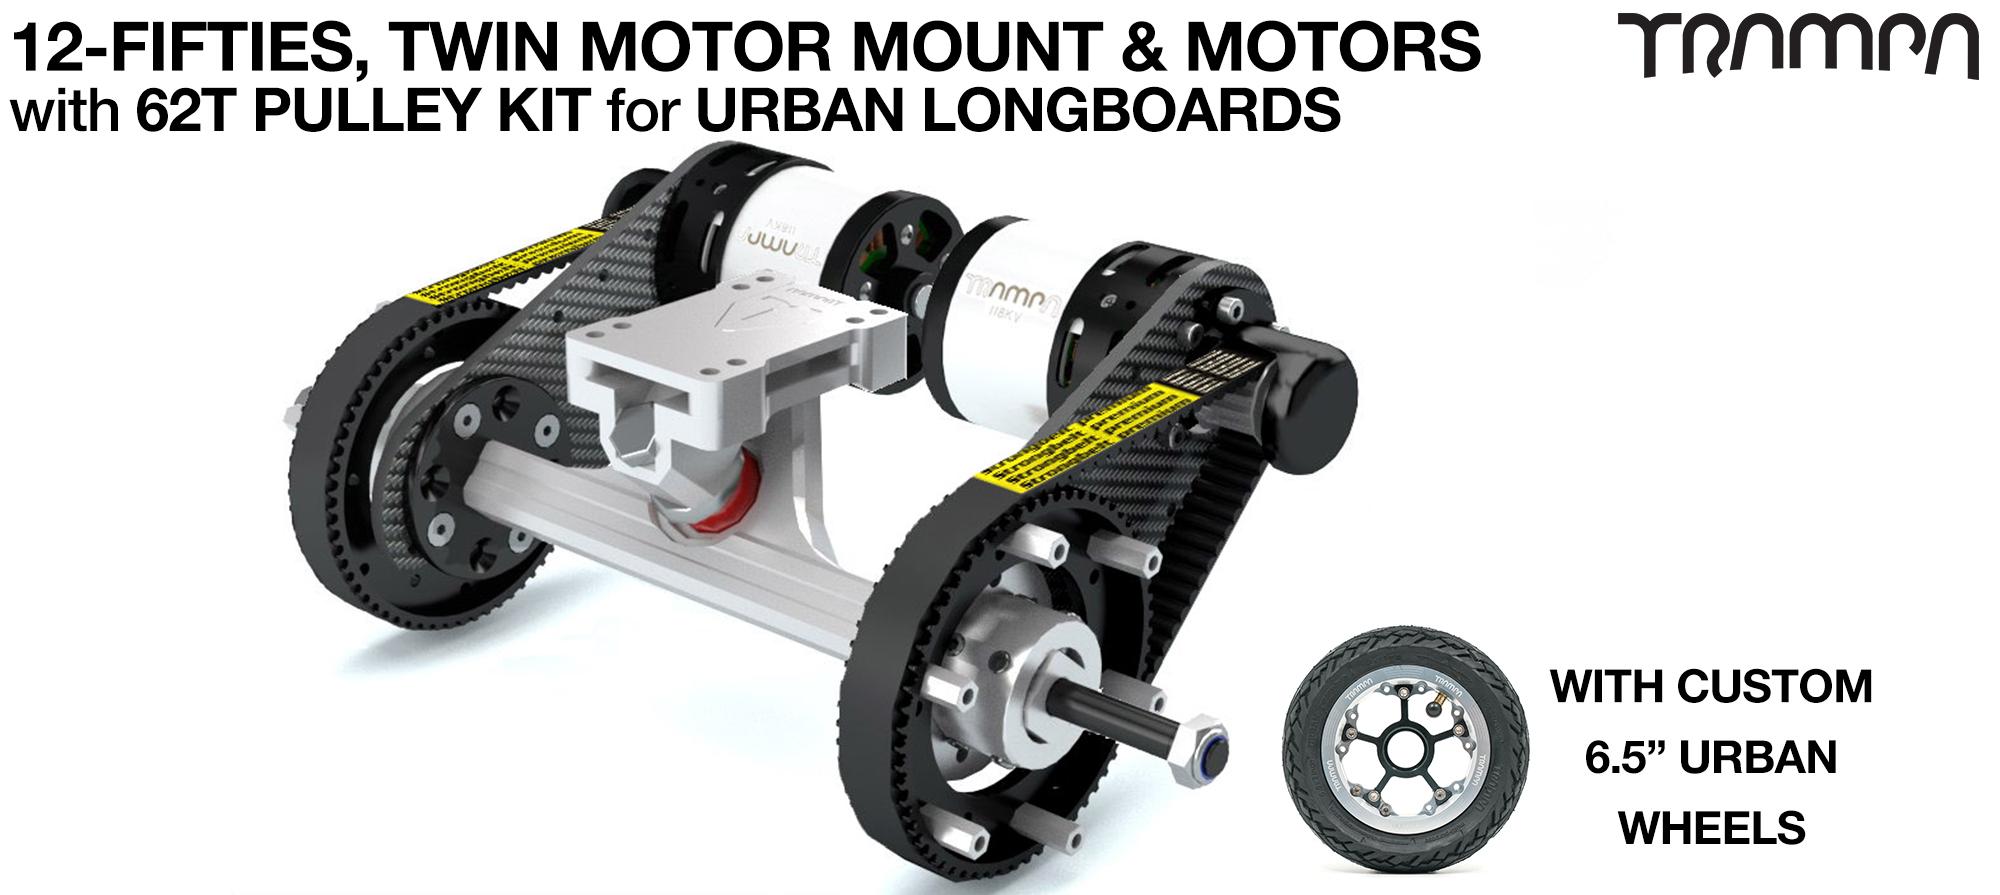 Original 12FiFties Motor Mount with 62 Tooth URBAN  Pulley Kit & Motor & 2x 12FiFties Trucks & 4x URBAN Wheels - TWIN